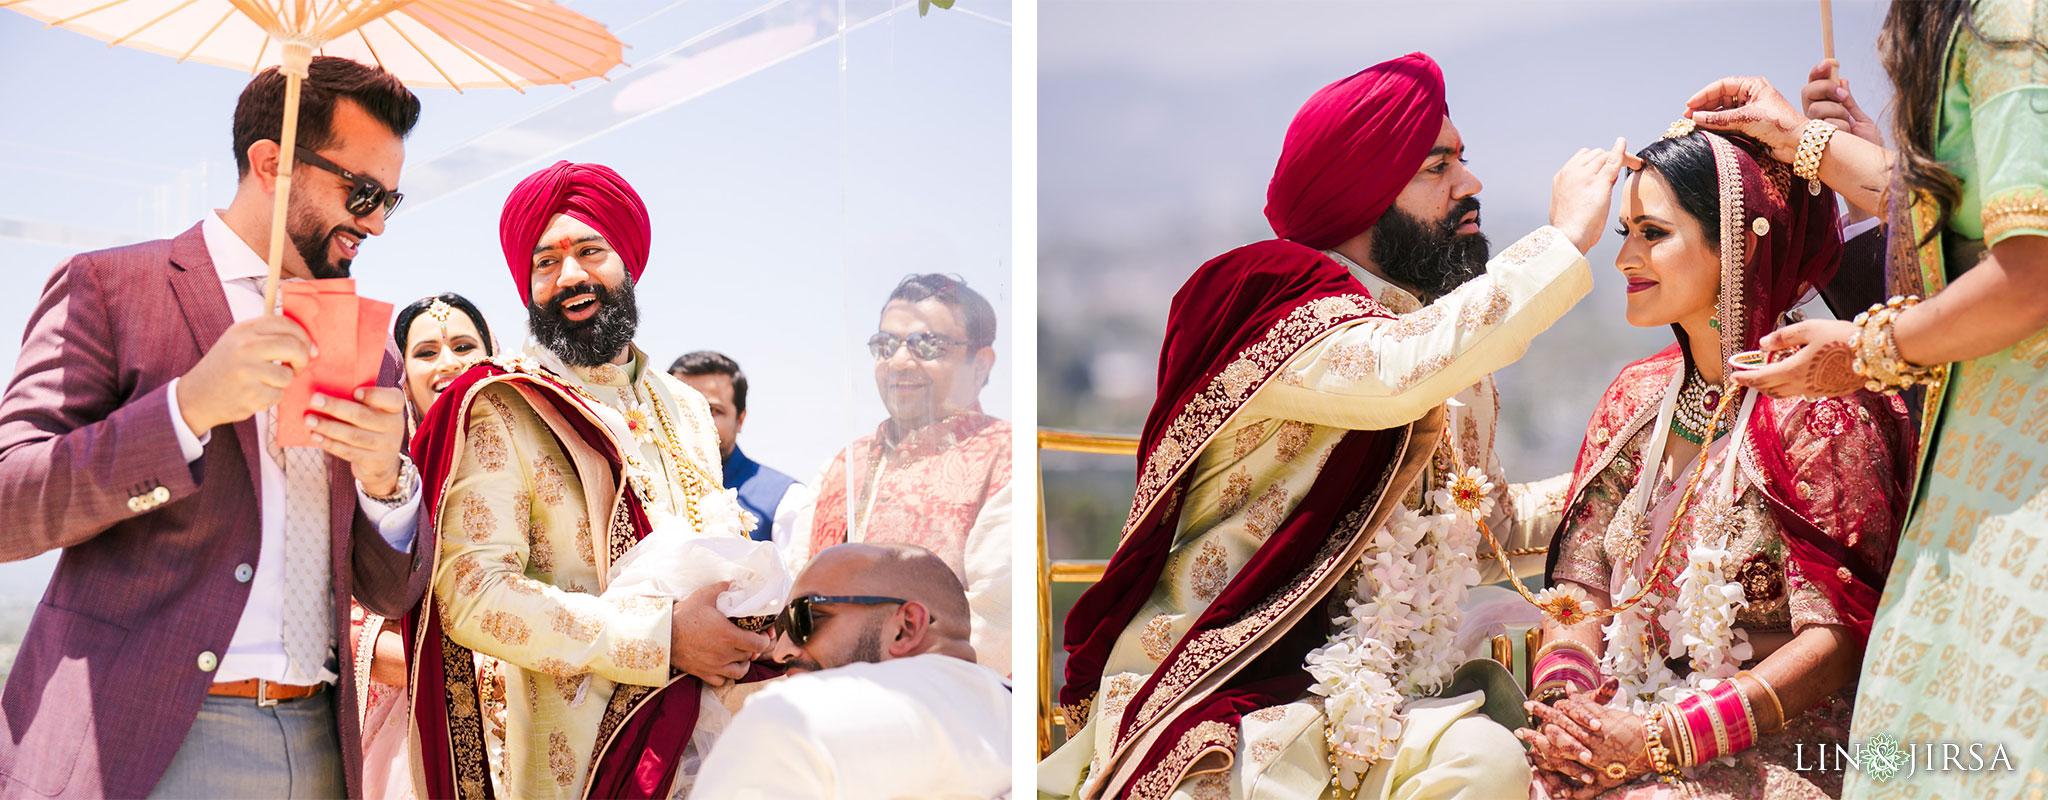 28 marina del rey marriott indian hindu ceremony photography